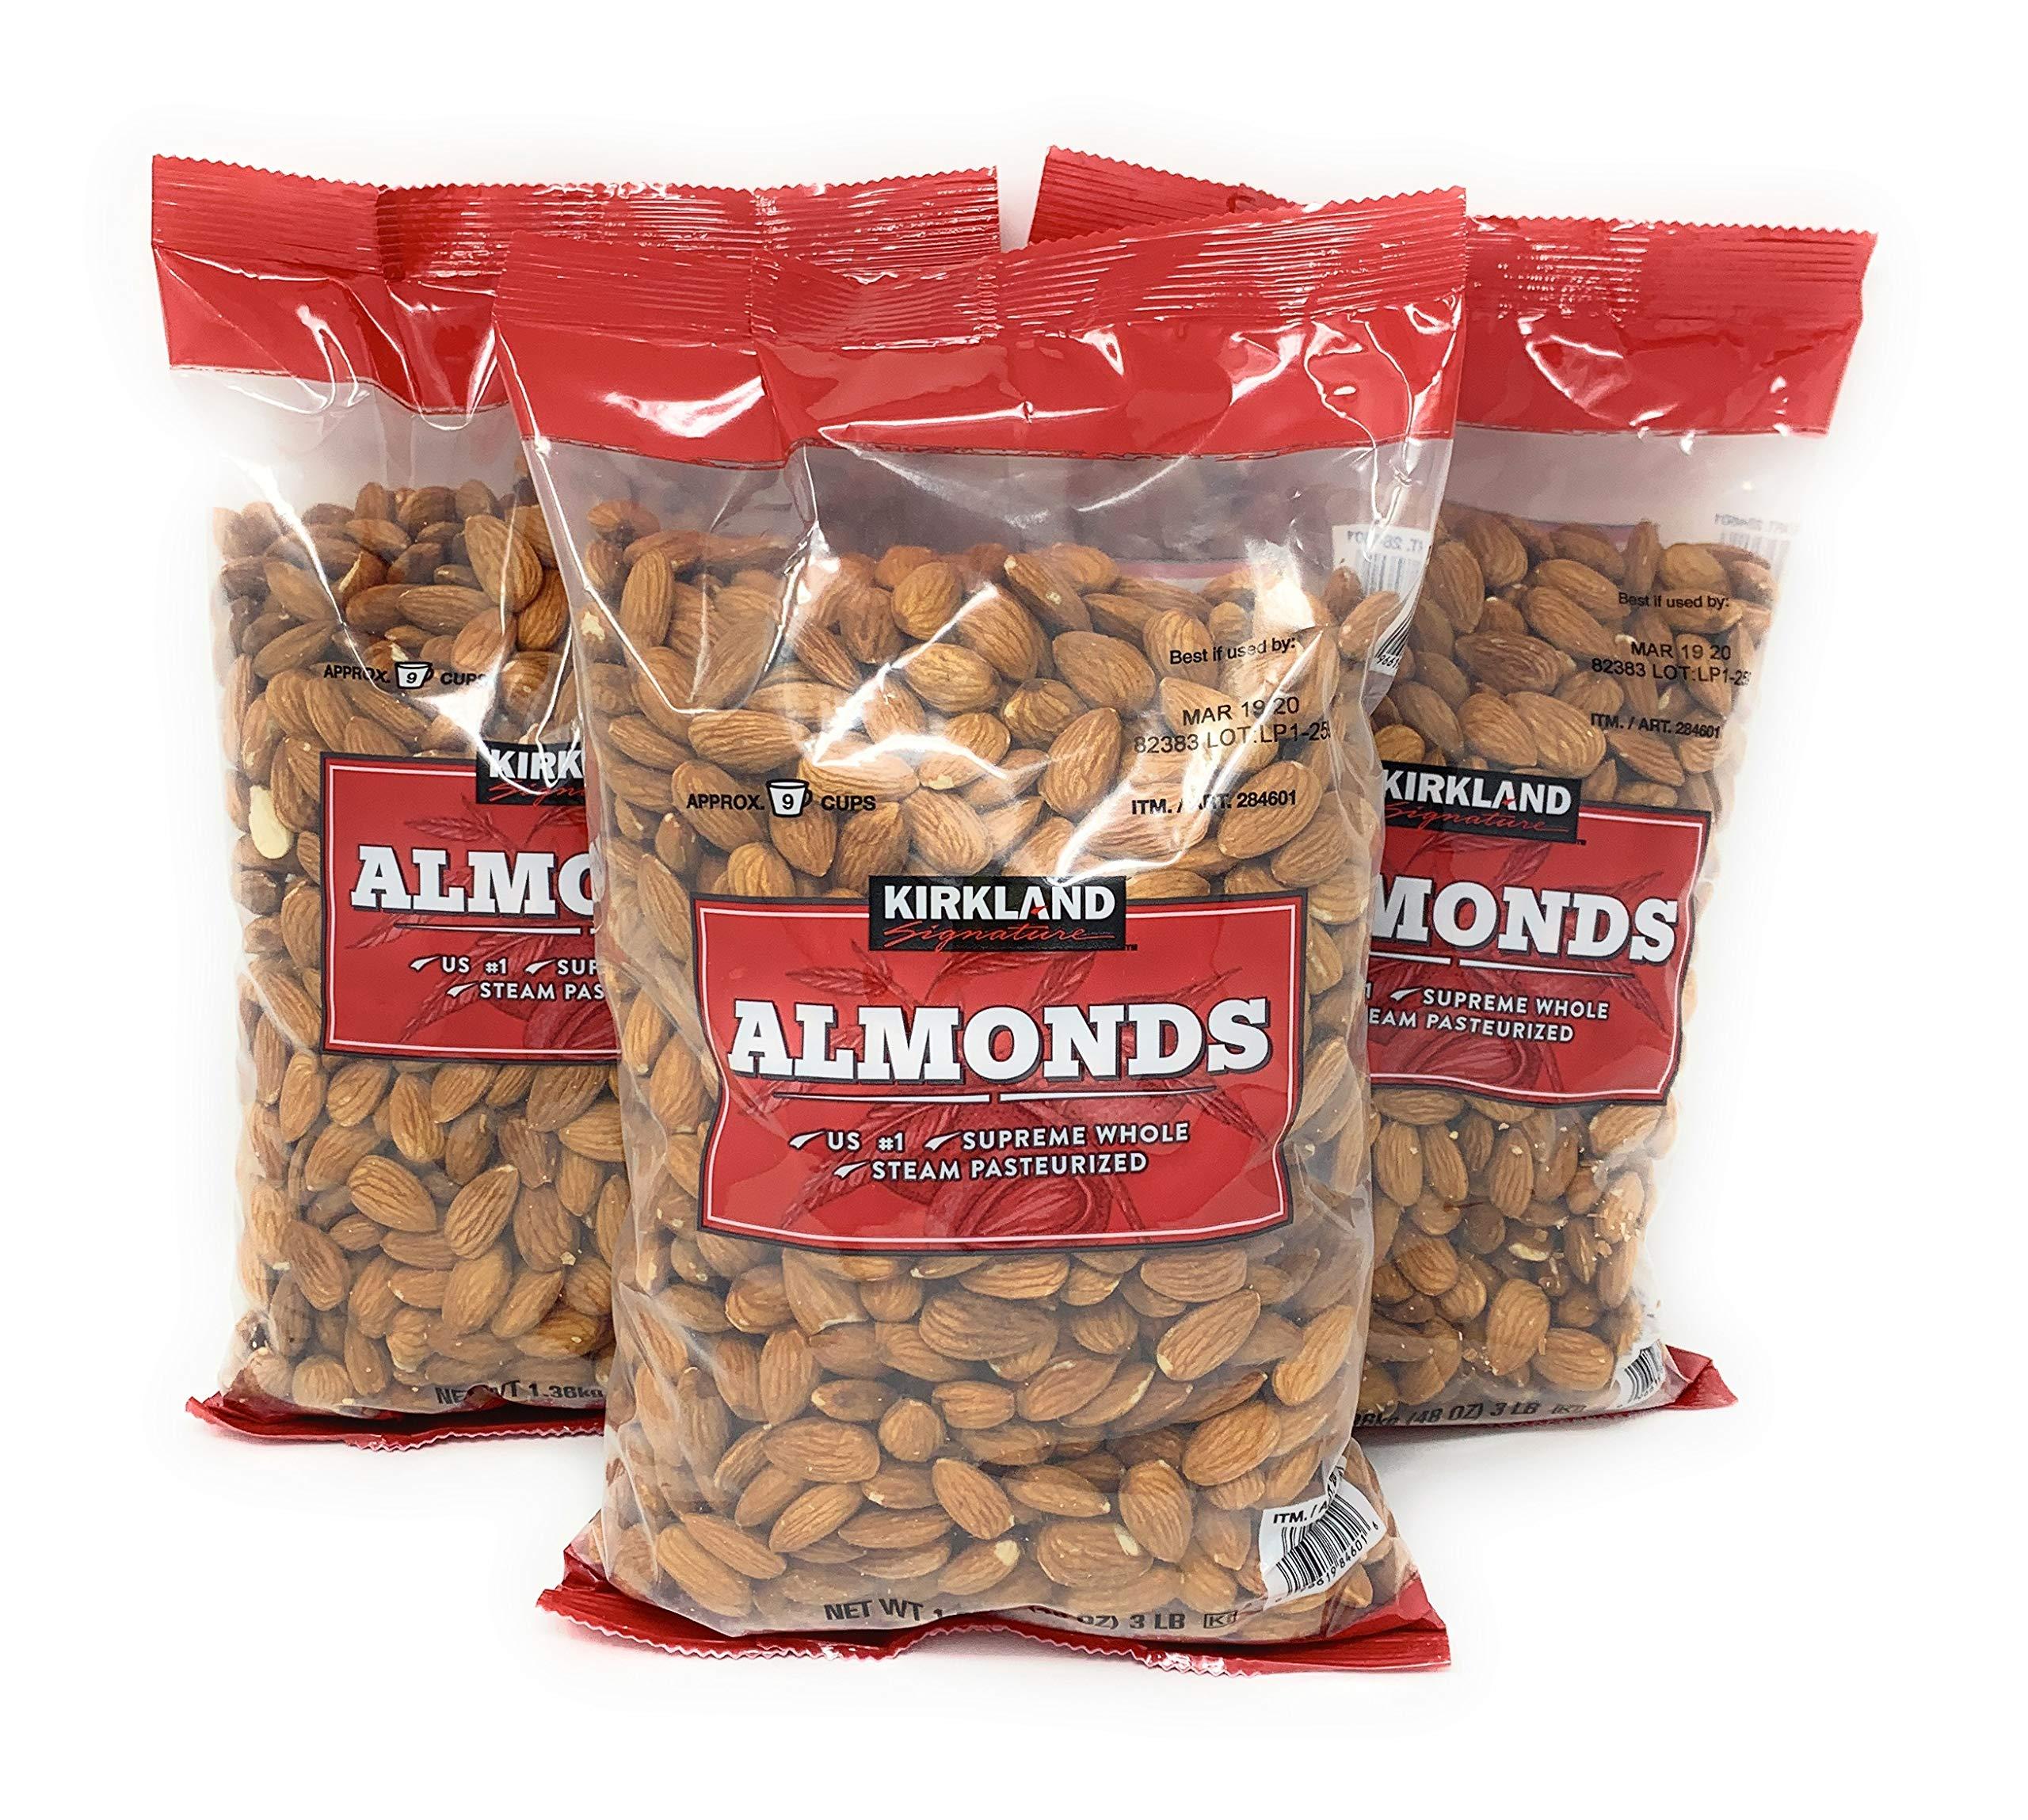 Kirkland Signature Supreme Whole Almonds, 3 Pack (3 Pounds)